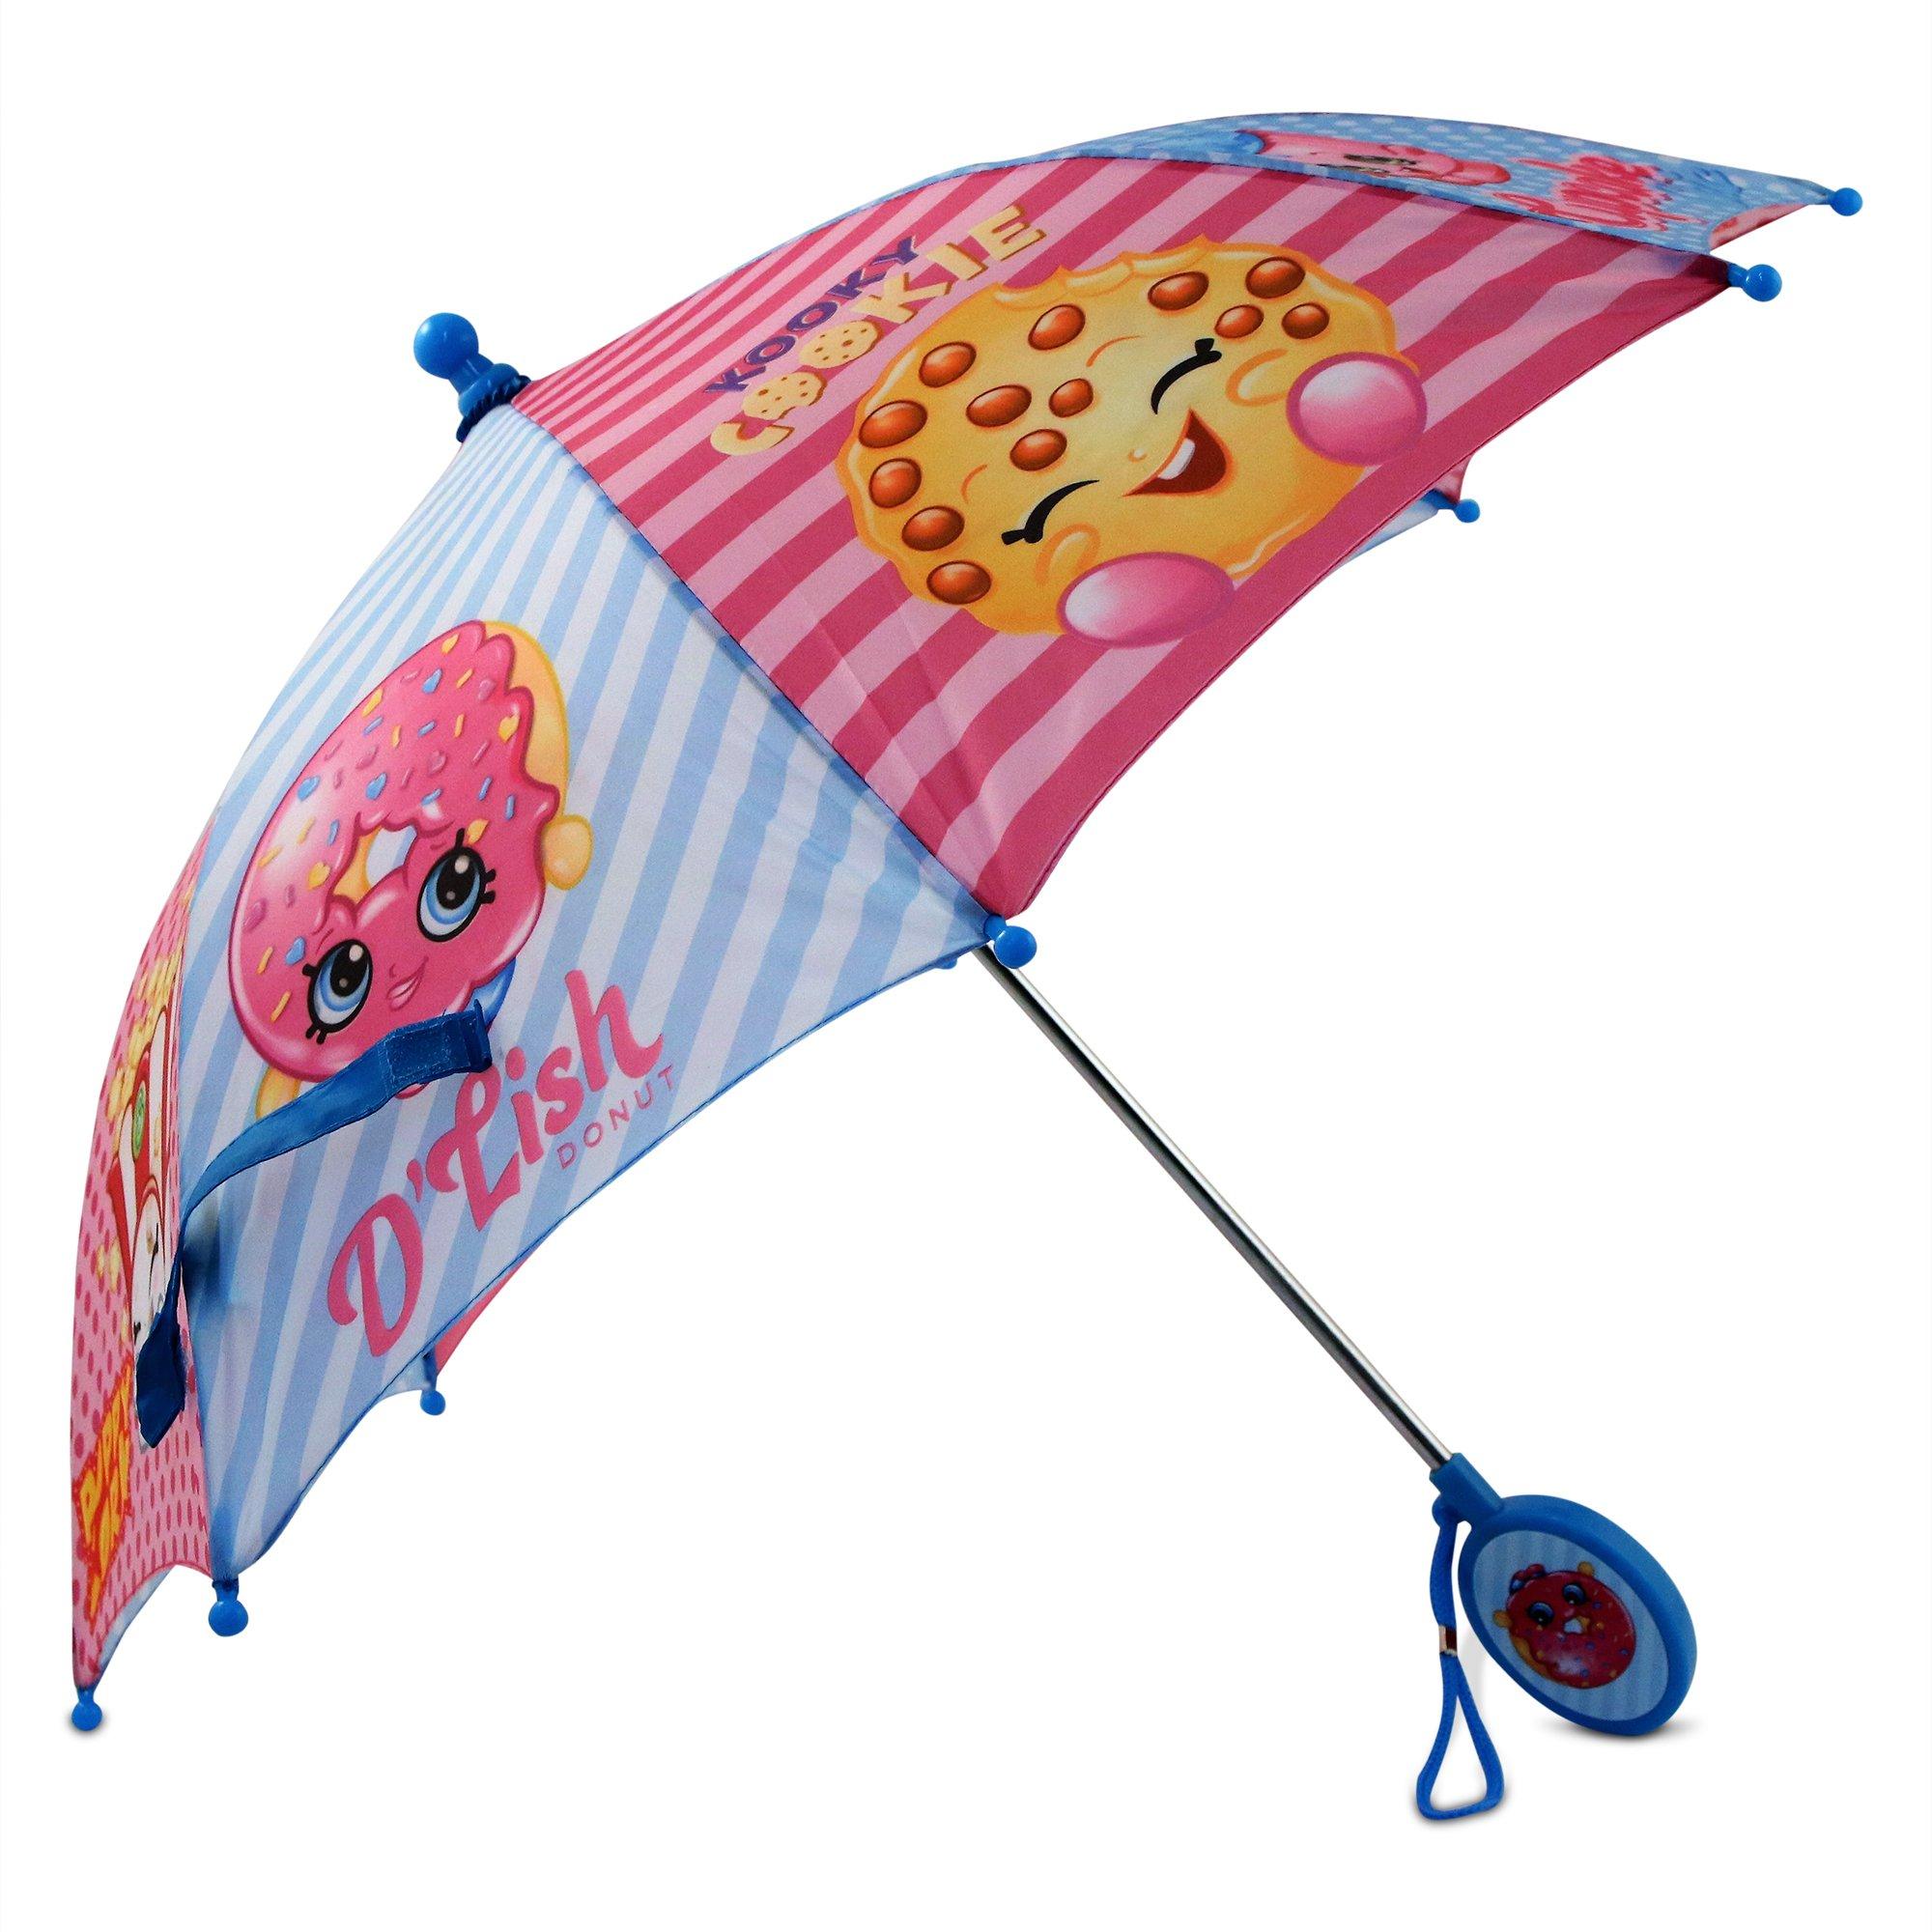 Shopkins Girls' Little Assorted Character Rainwear Umbrella, Blue/Pink, Age 3-7